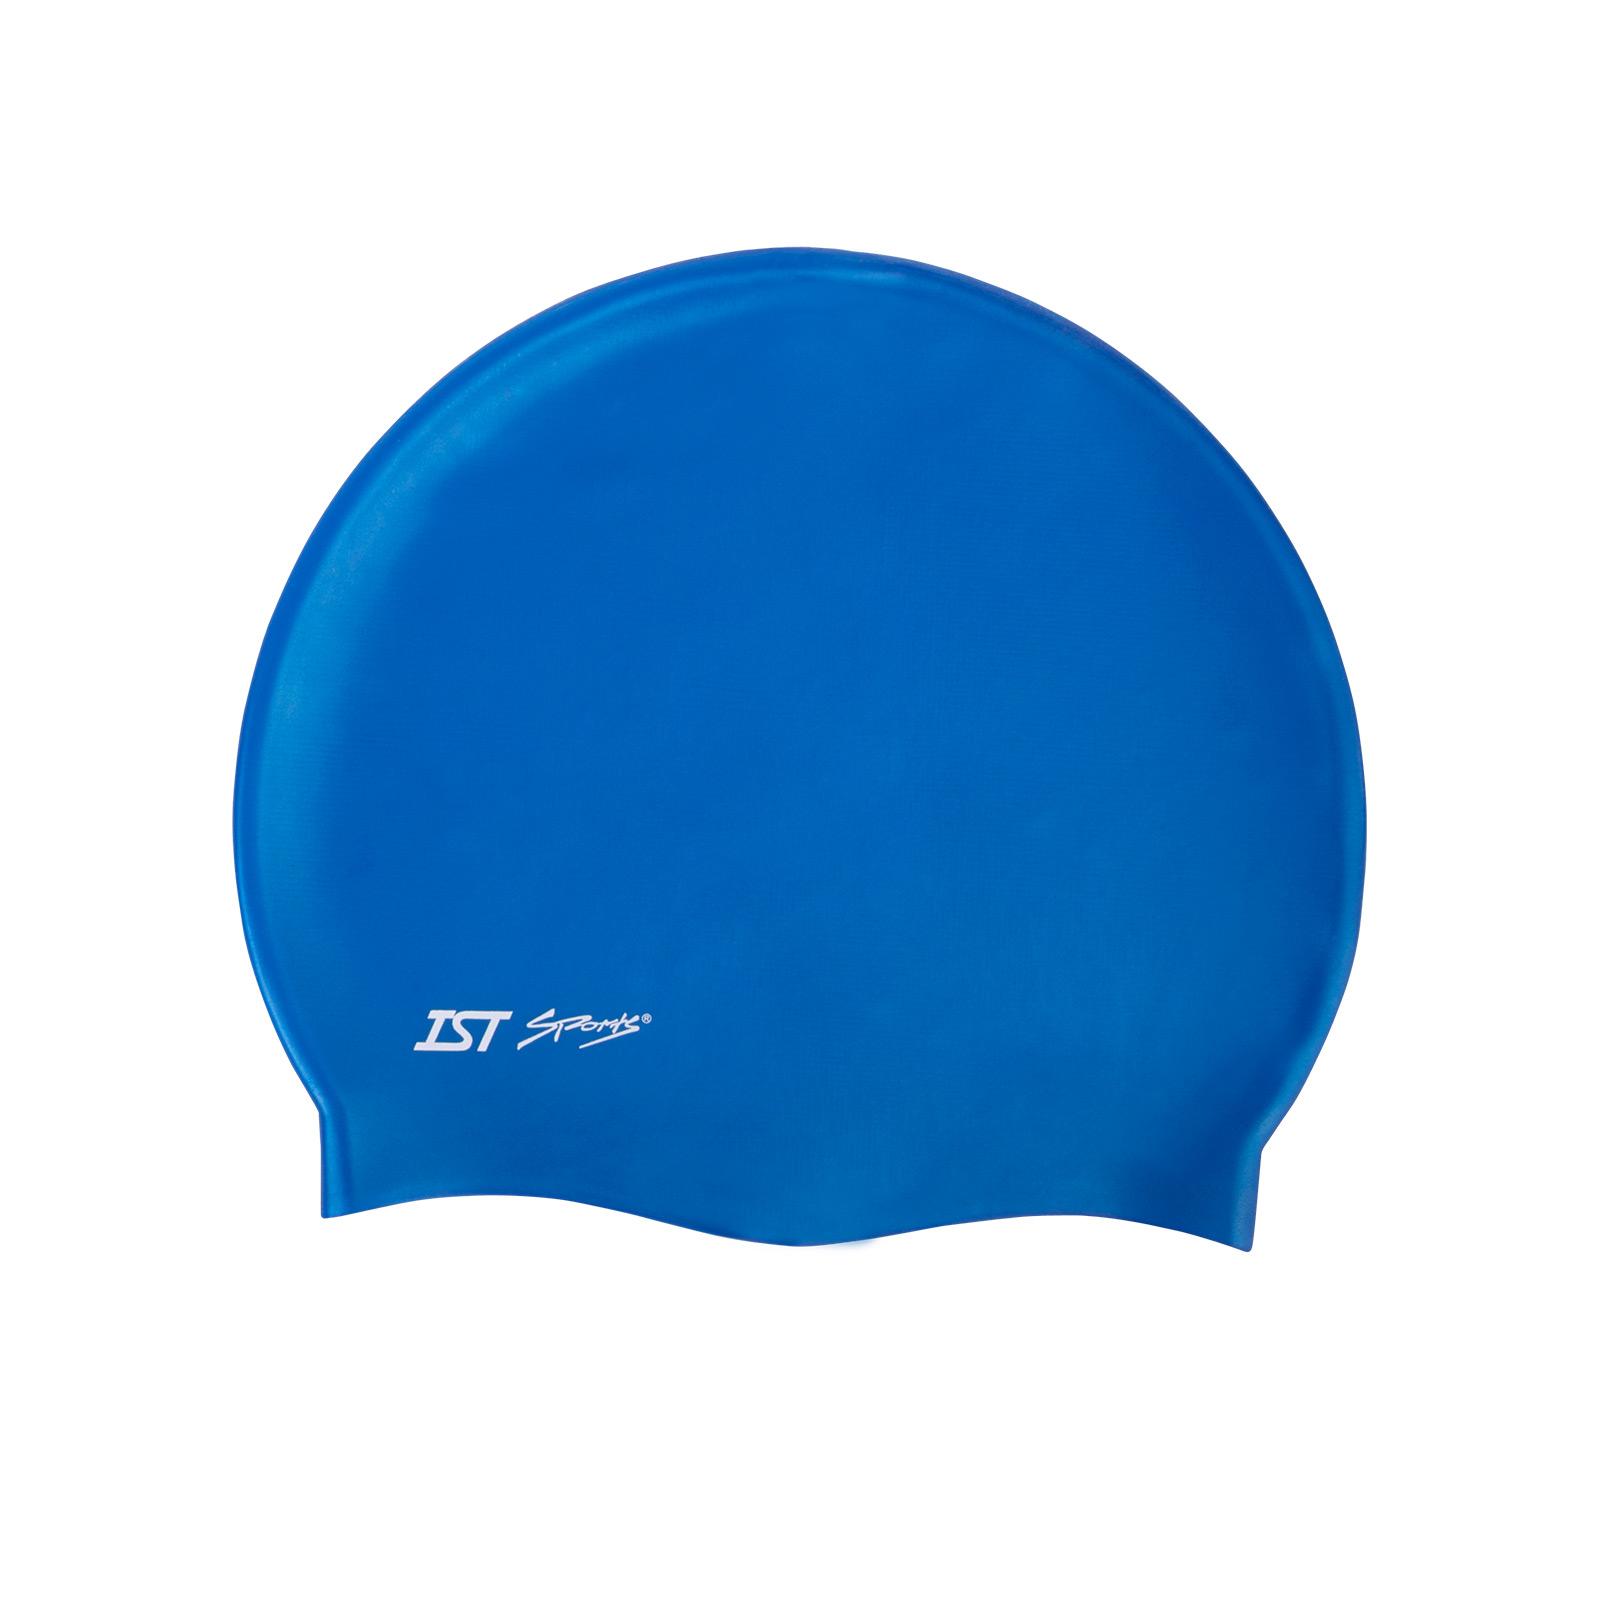 Silicone Swimming Cap